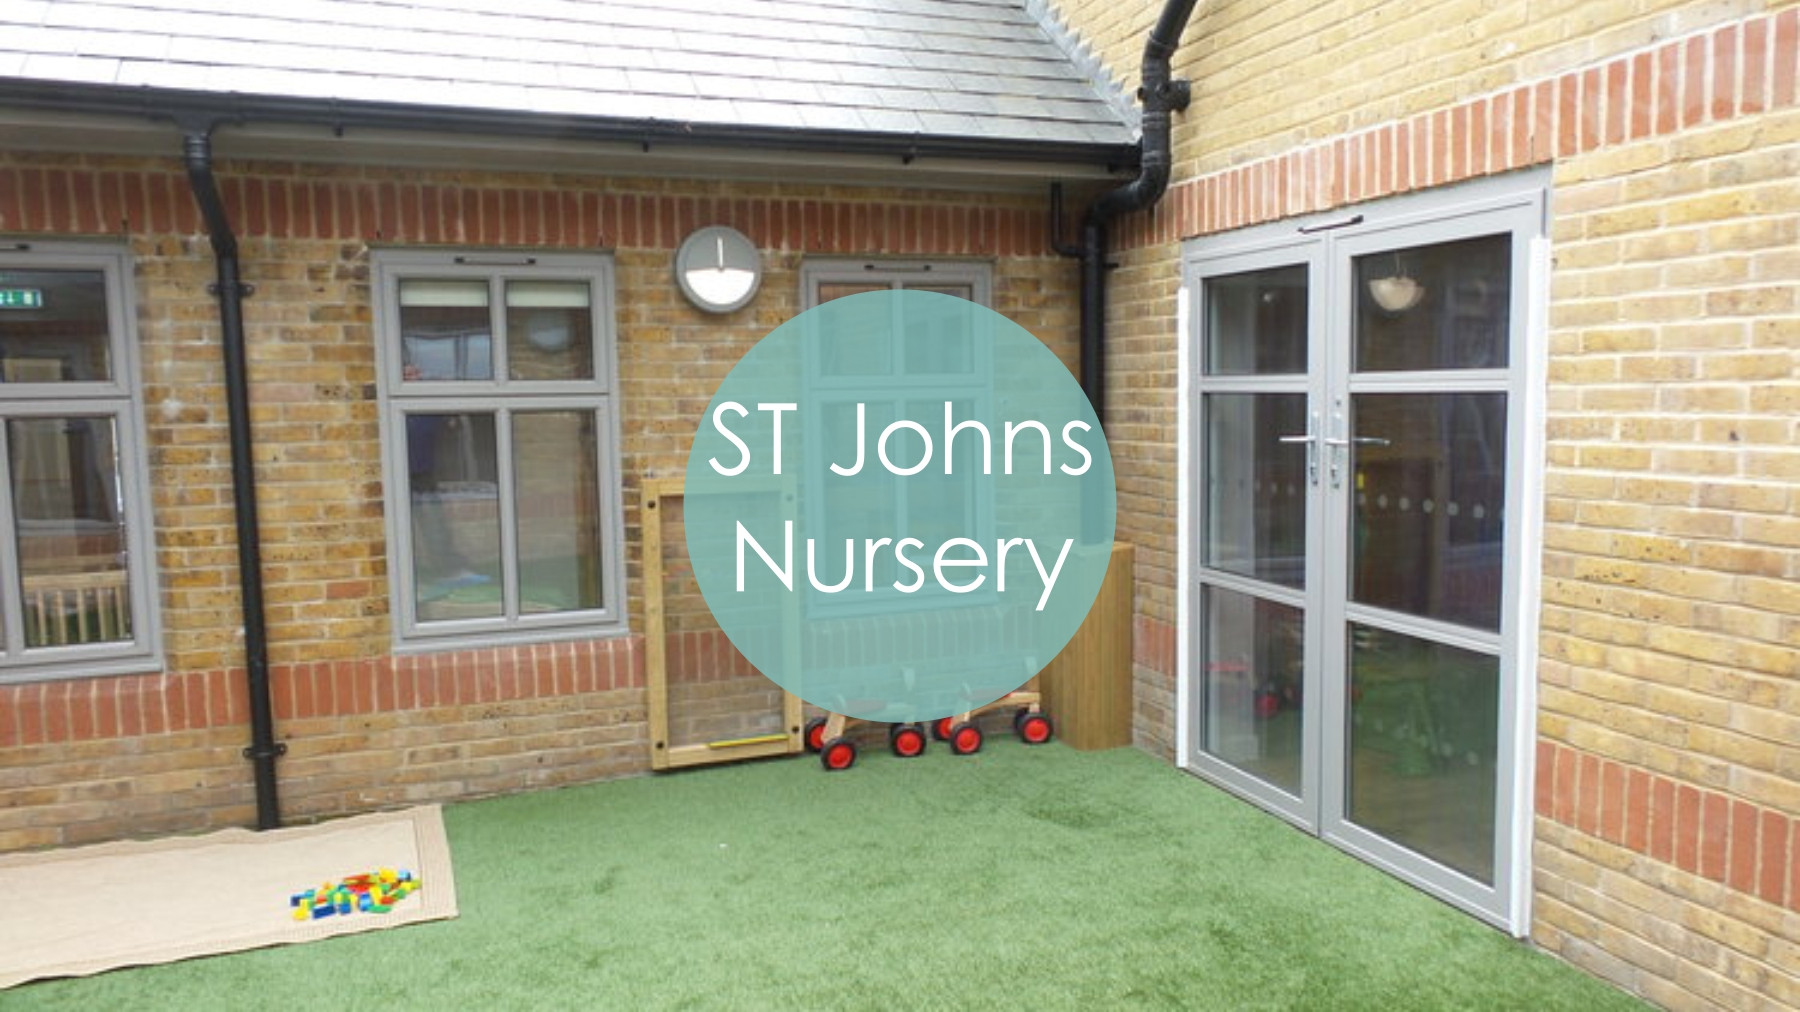 st-johns-nursery.jpg